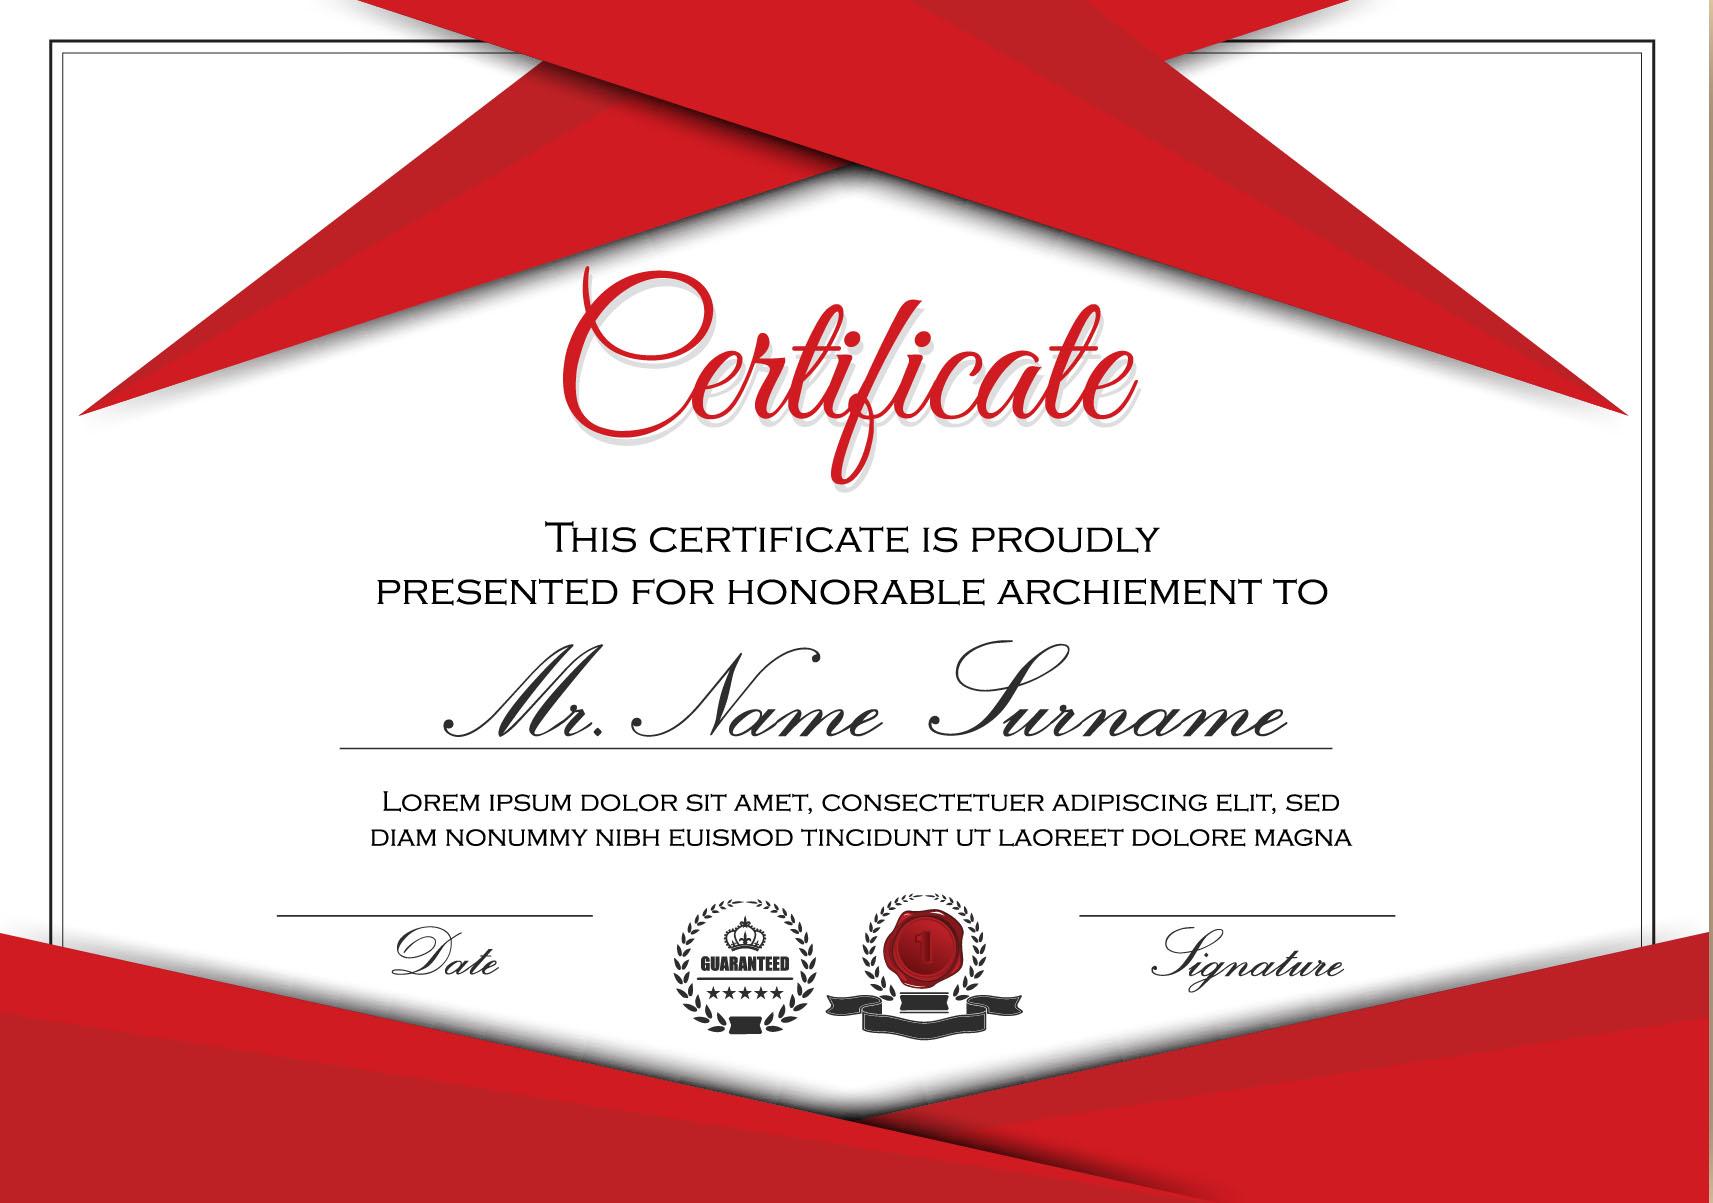 Roten Stile Zertifikat Vorlage Vektor 04 - WeLoveSoLo